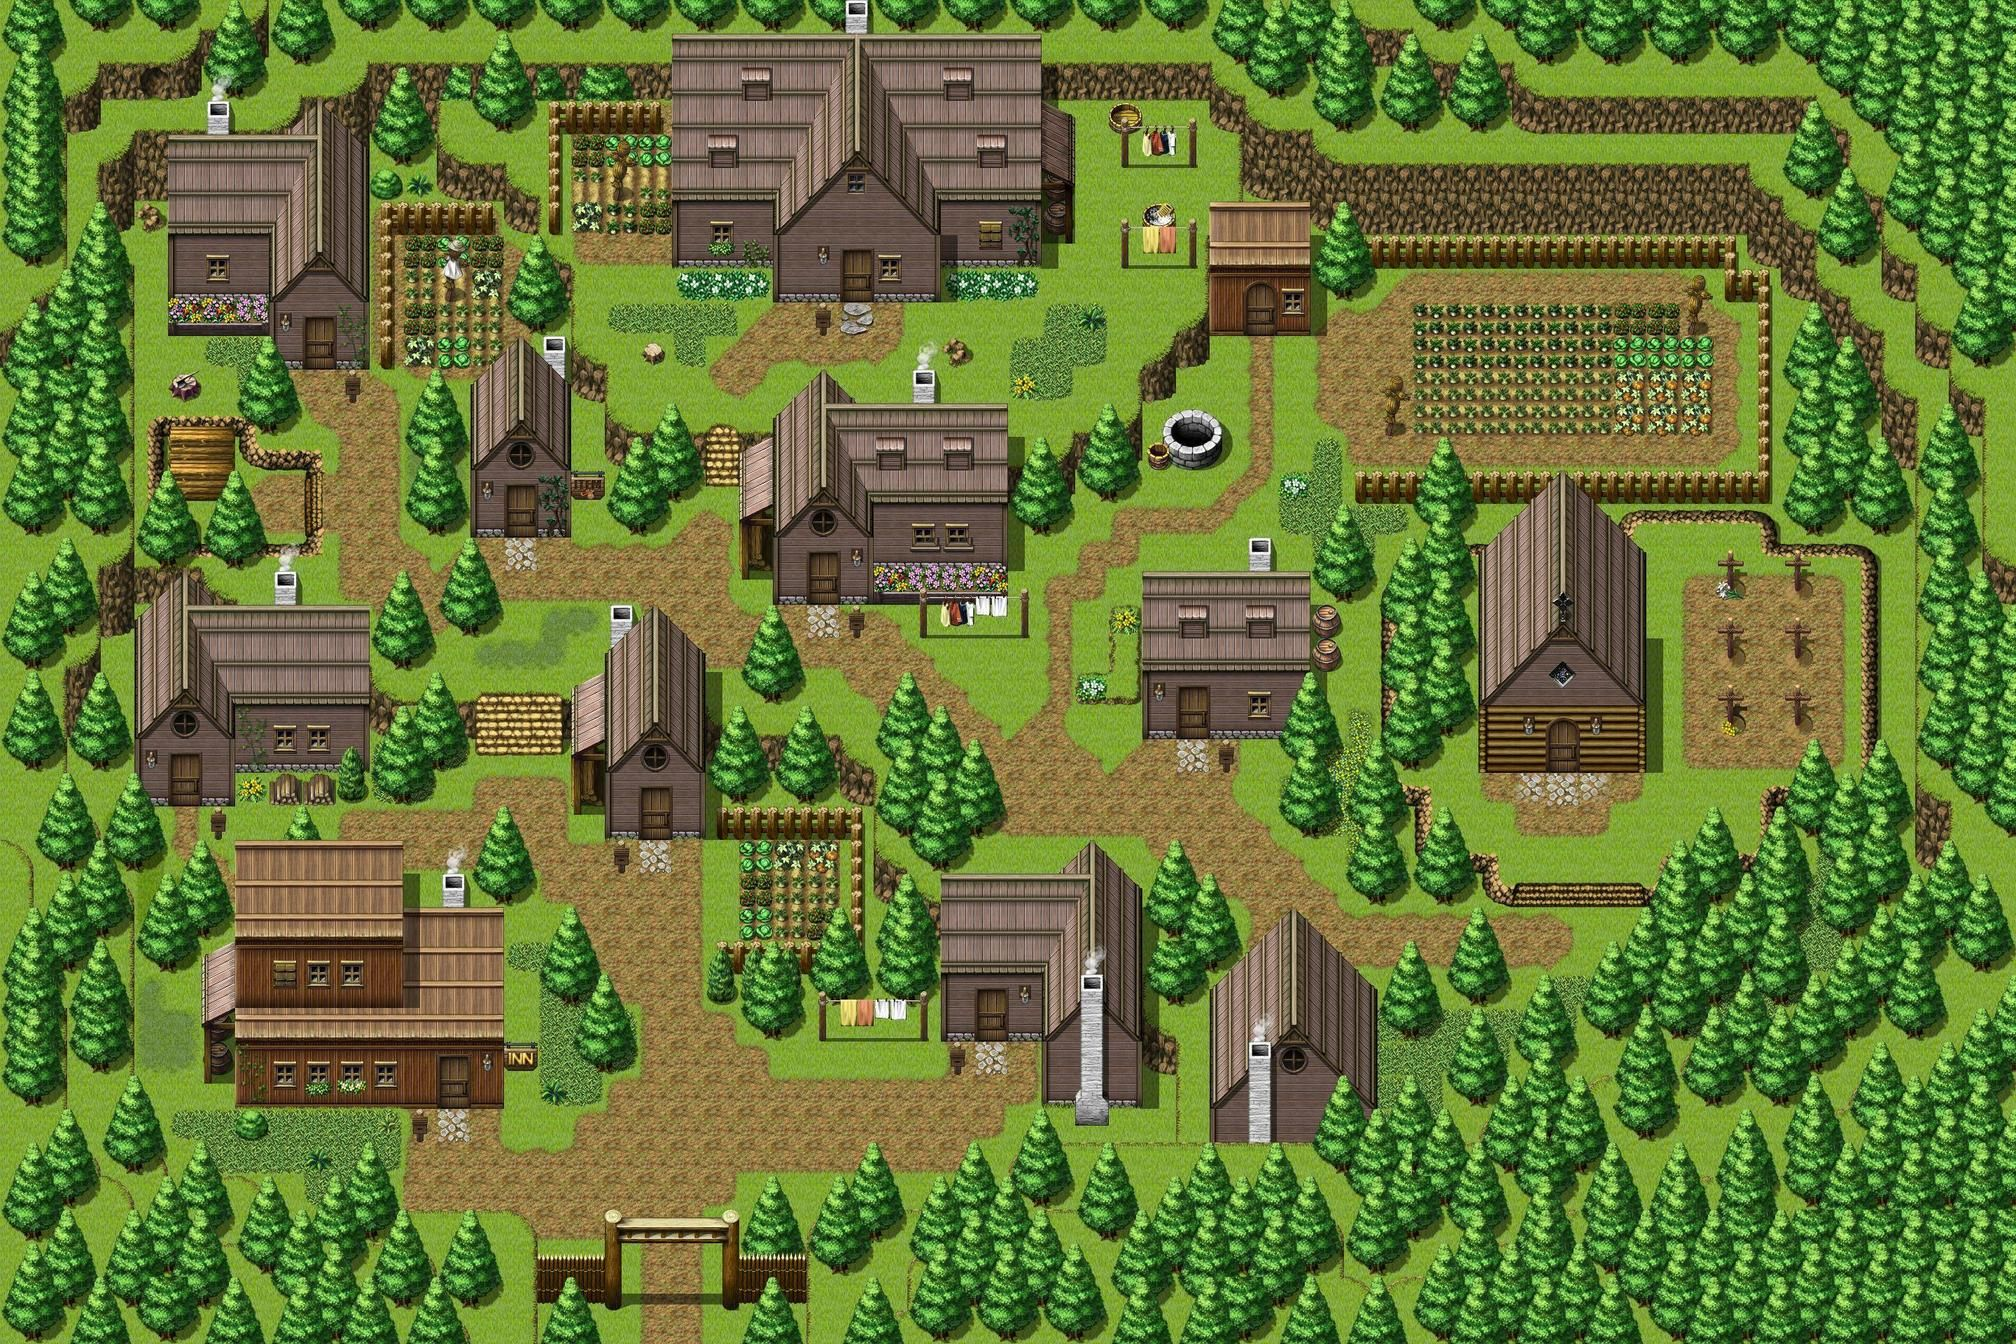 Pin by Troy Hepfner on RPG Maker Maps in 2019 | Pixel art